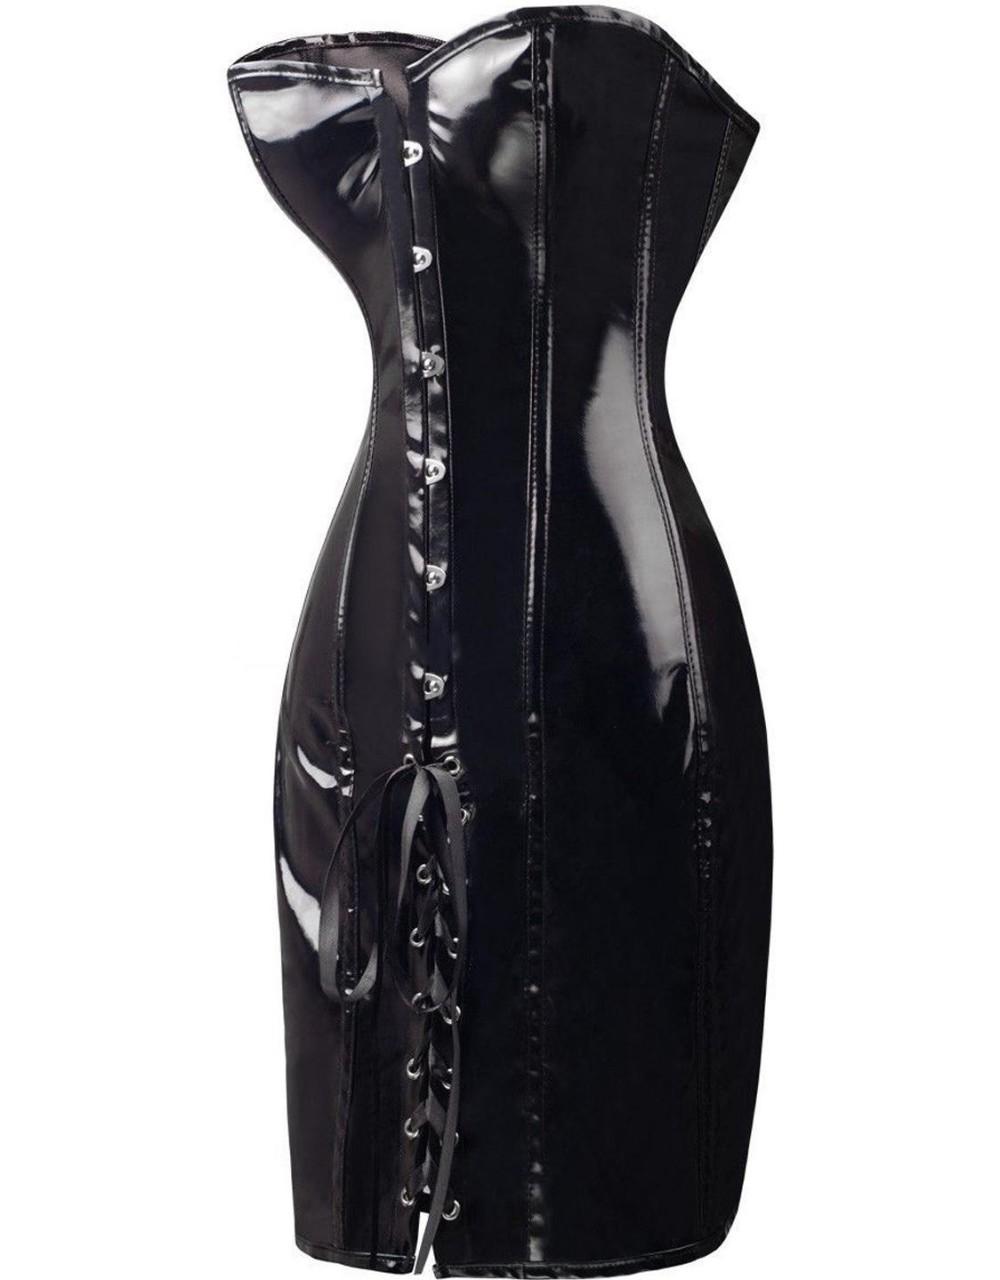 Sexy-Corset-CB371632B-1